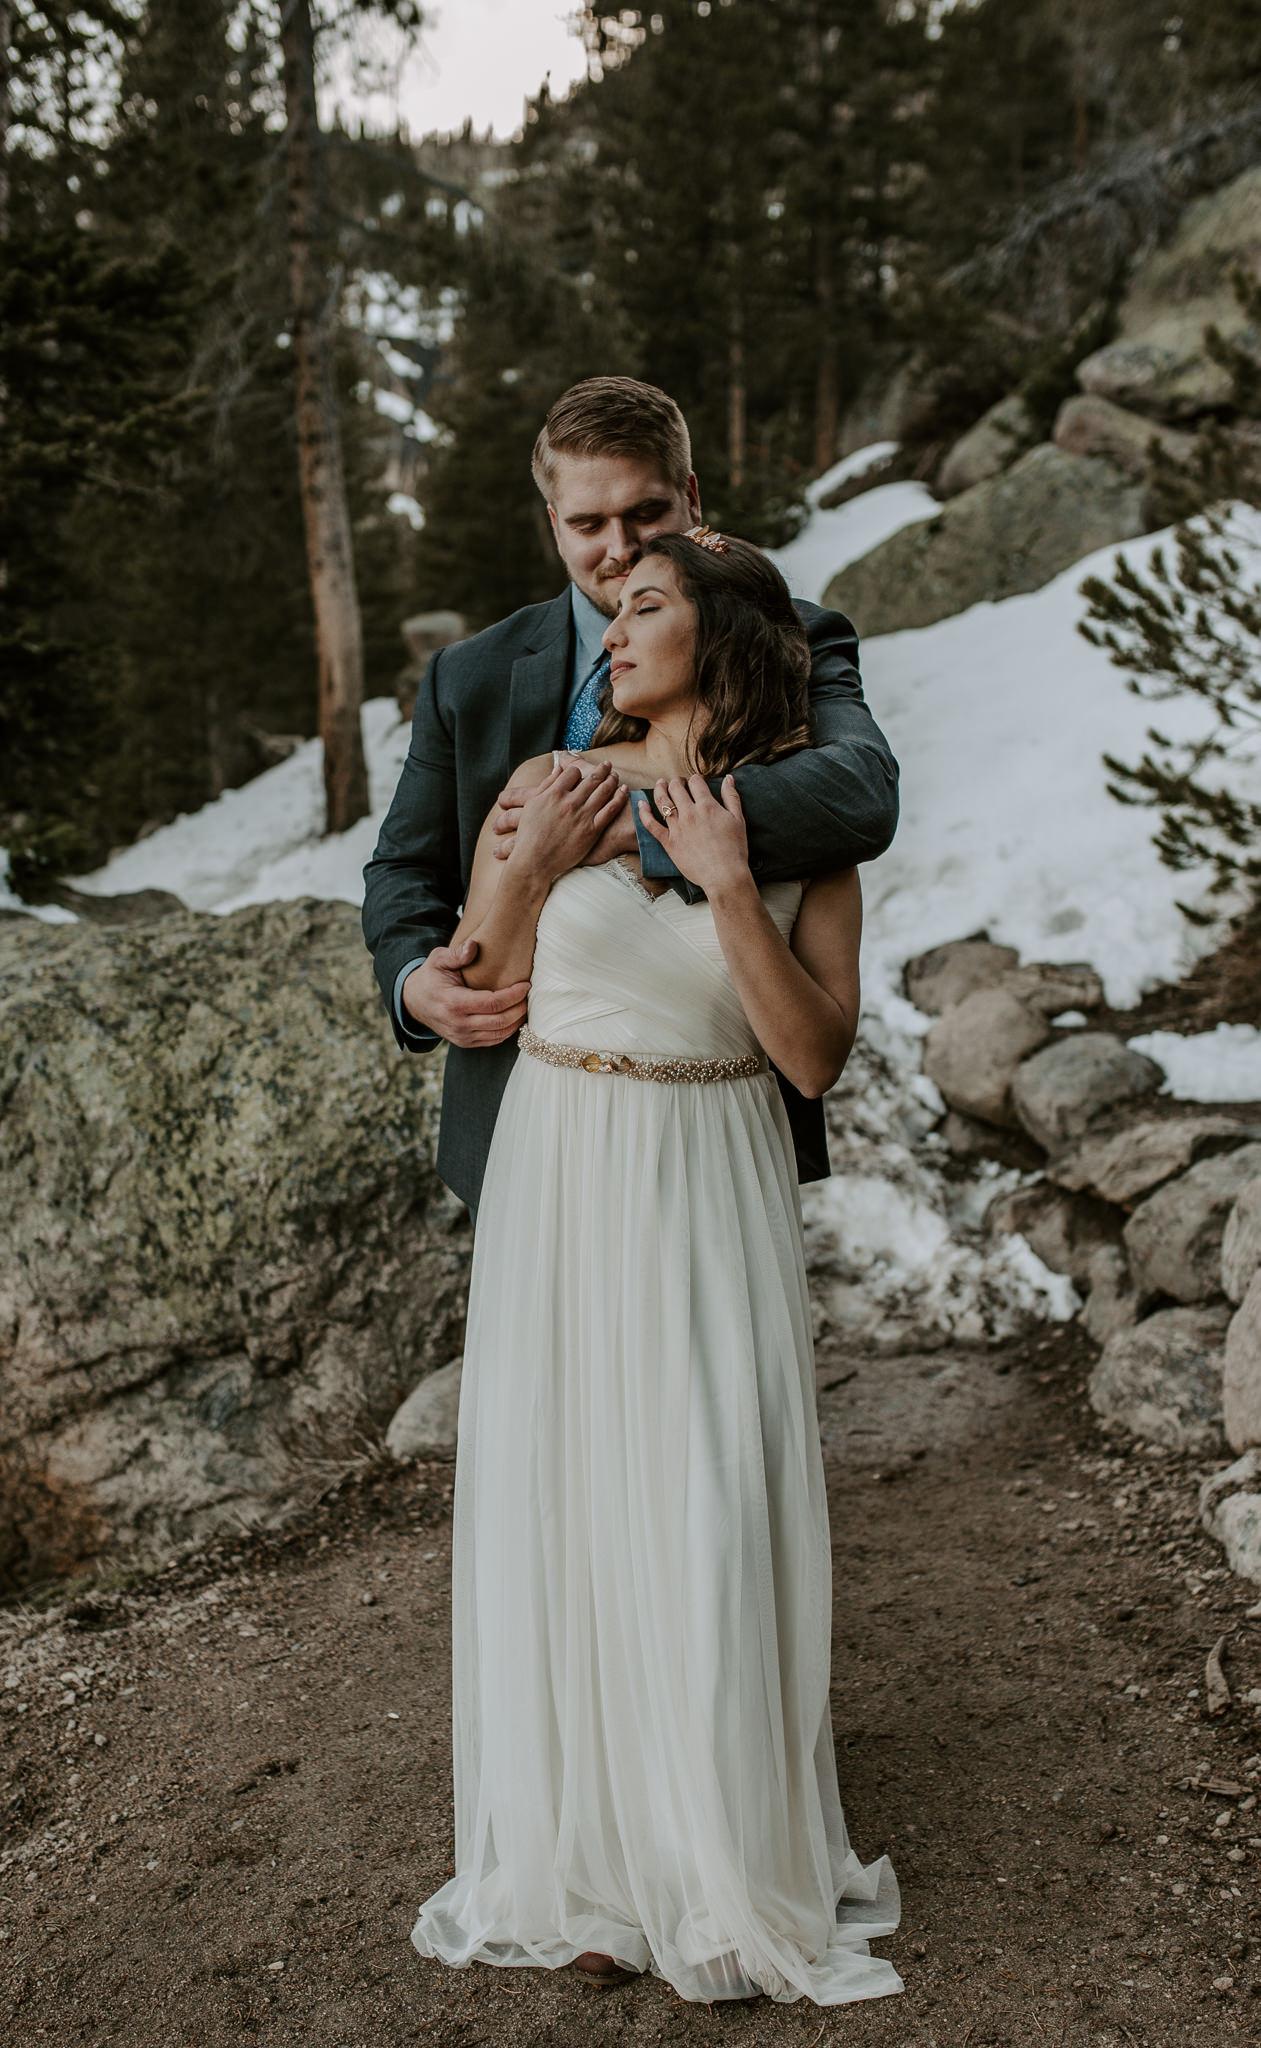 RMNP Wedding Photographer